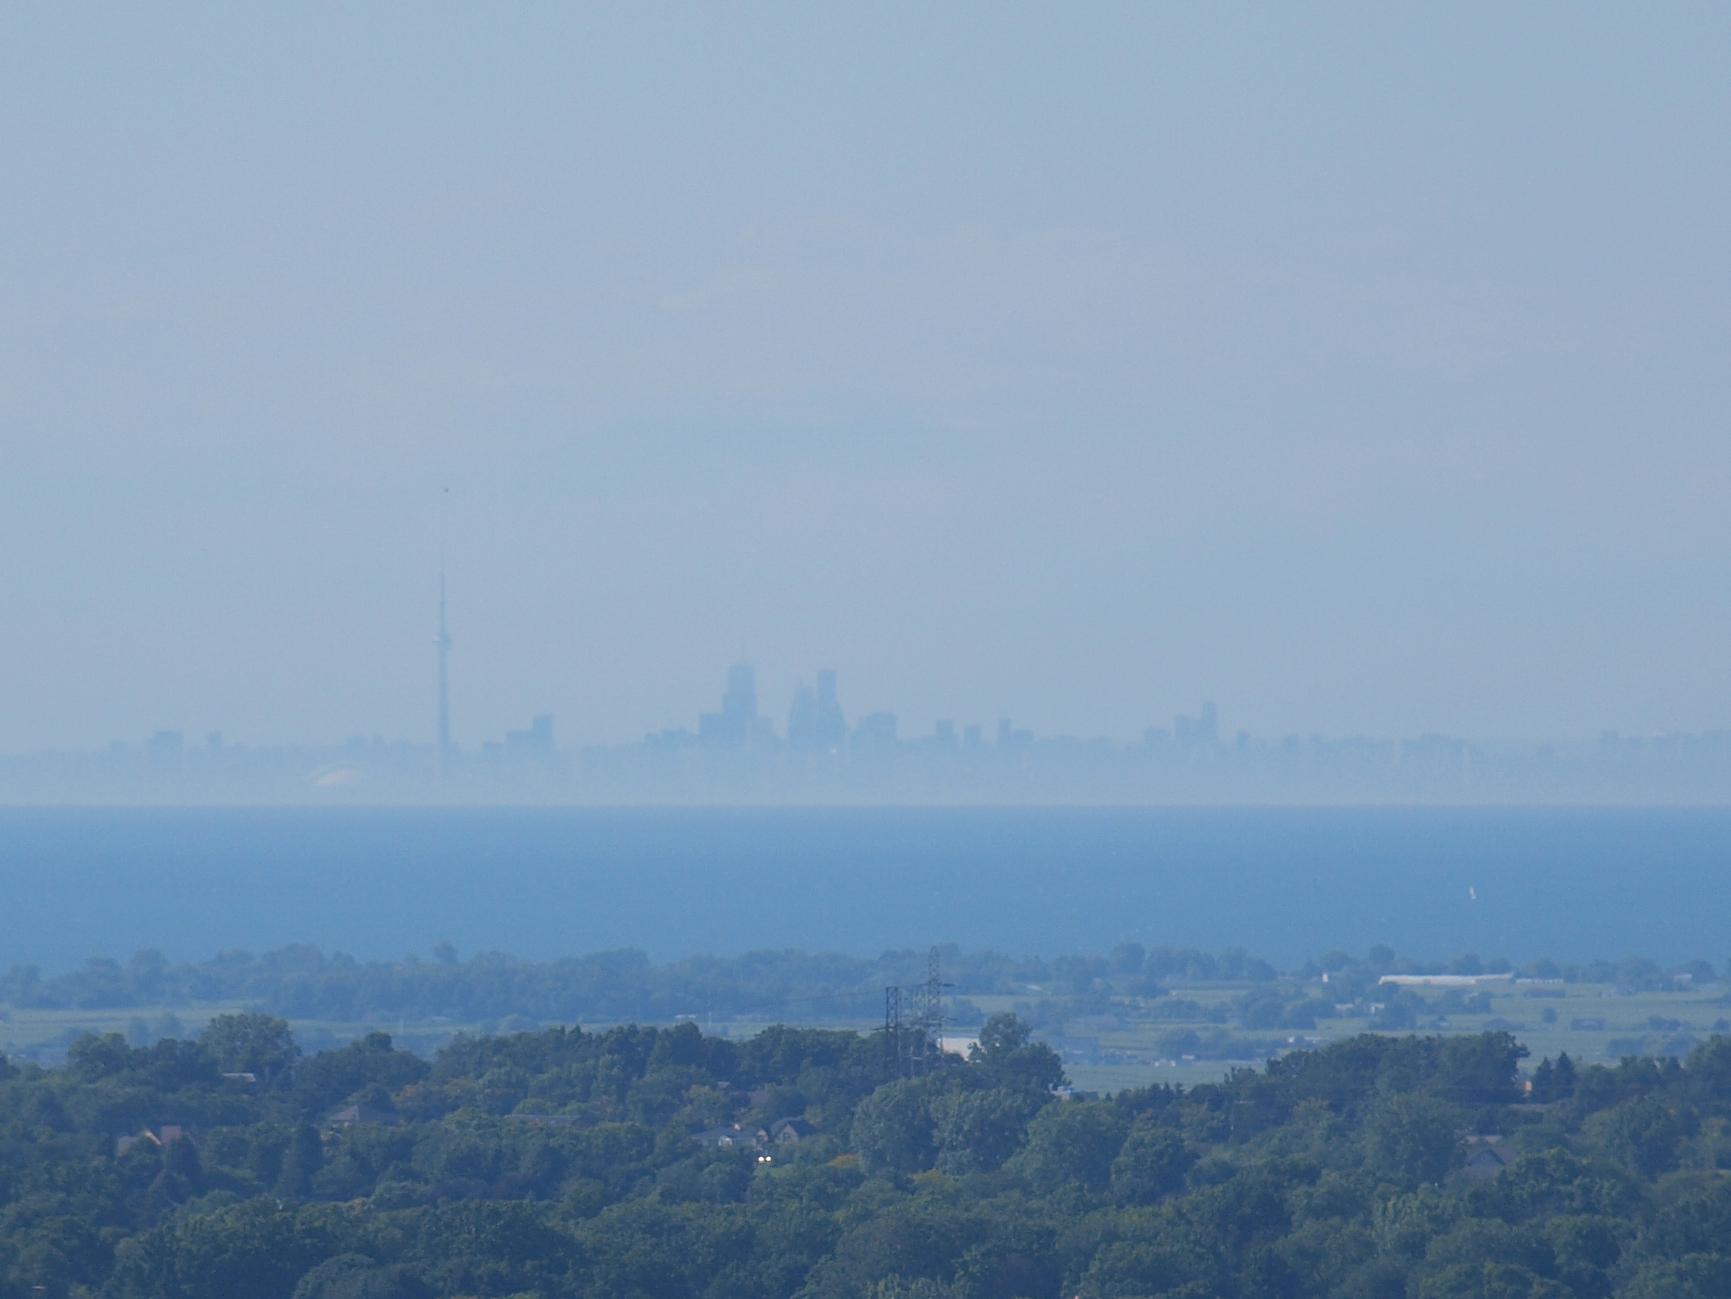 File Cn Tower As Seen From Skylon Tower Niagara Falls Jpg Wikimedia Commons